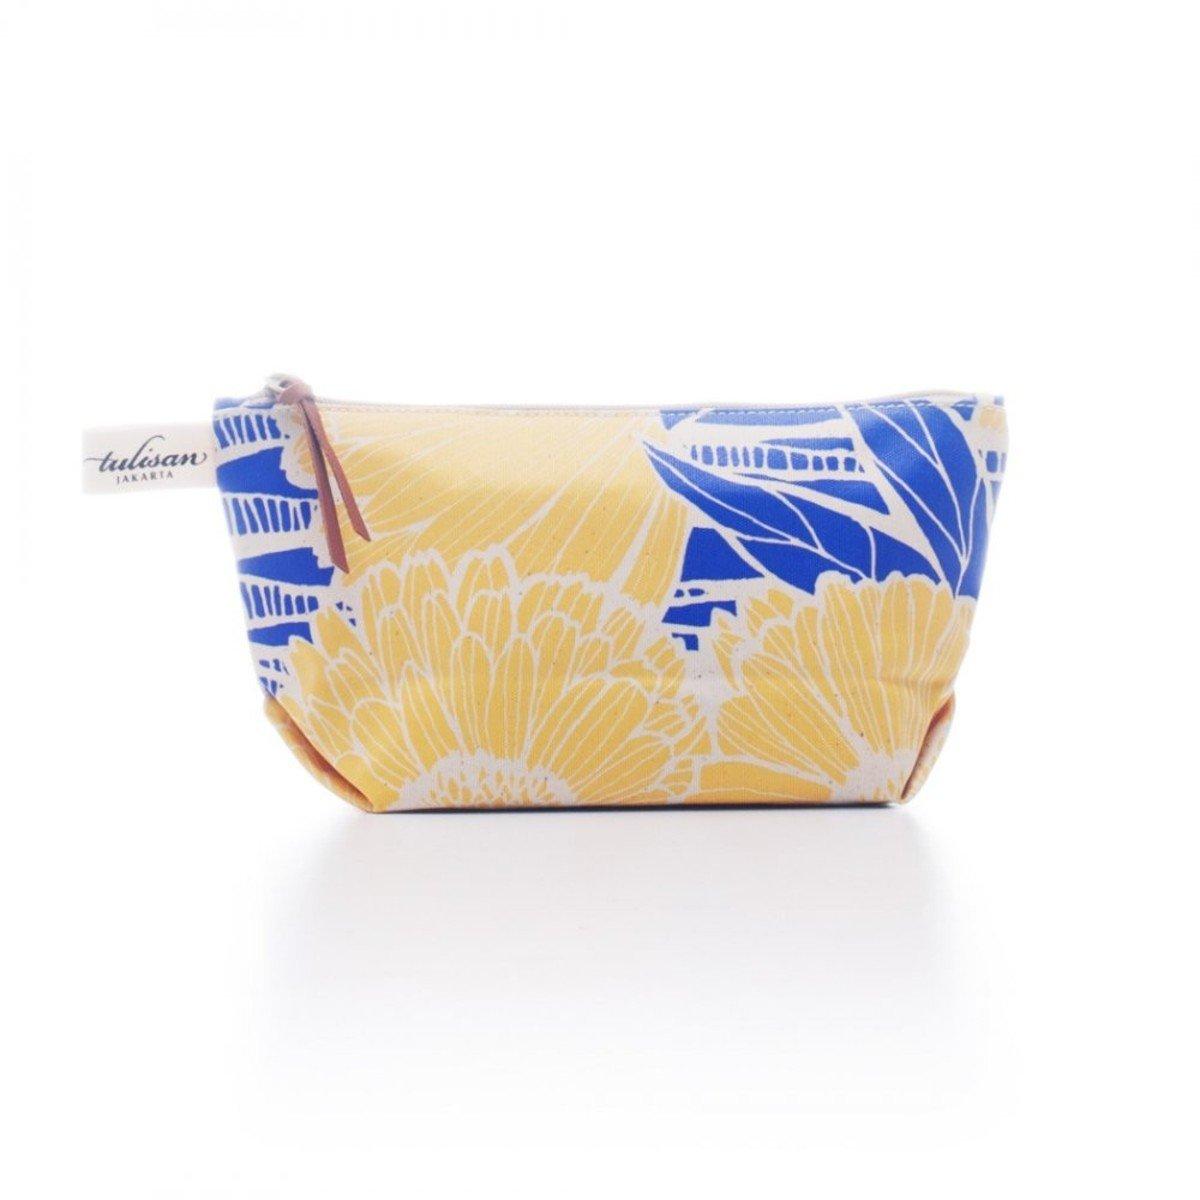 化妝袋 (中) - Yellow Sunflower